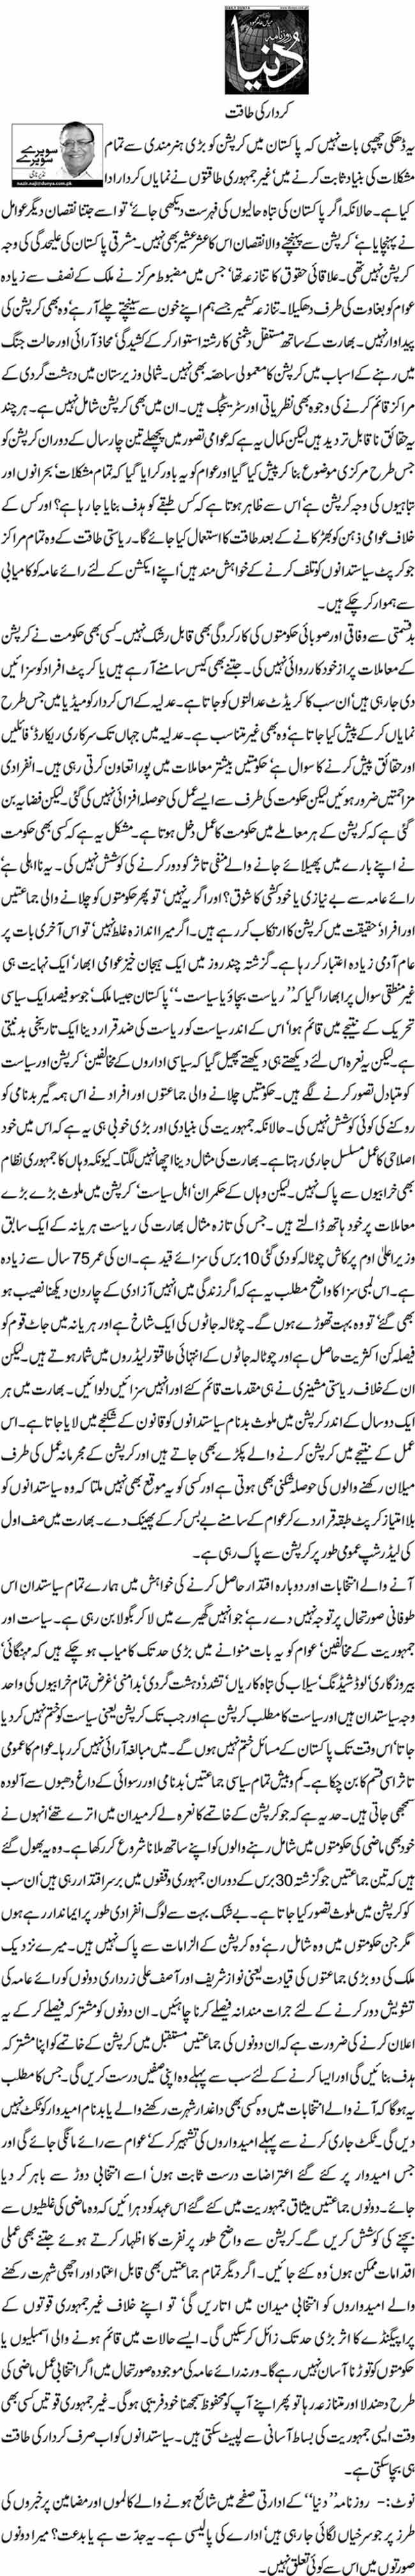 Kirdaar ki taqat - Nazeer Naji